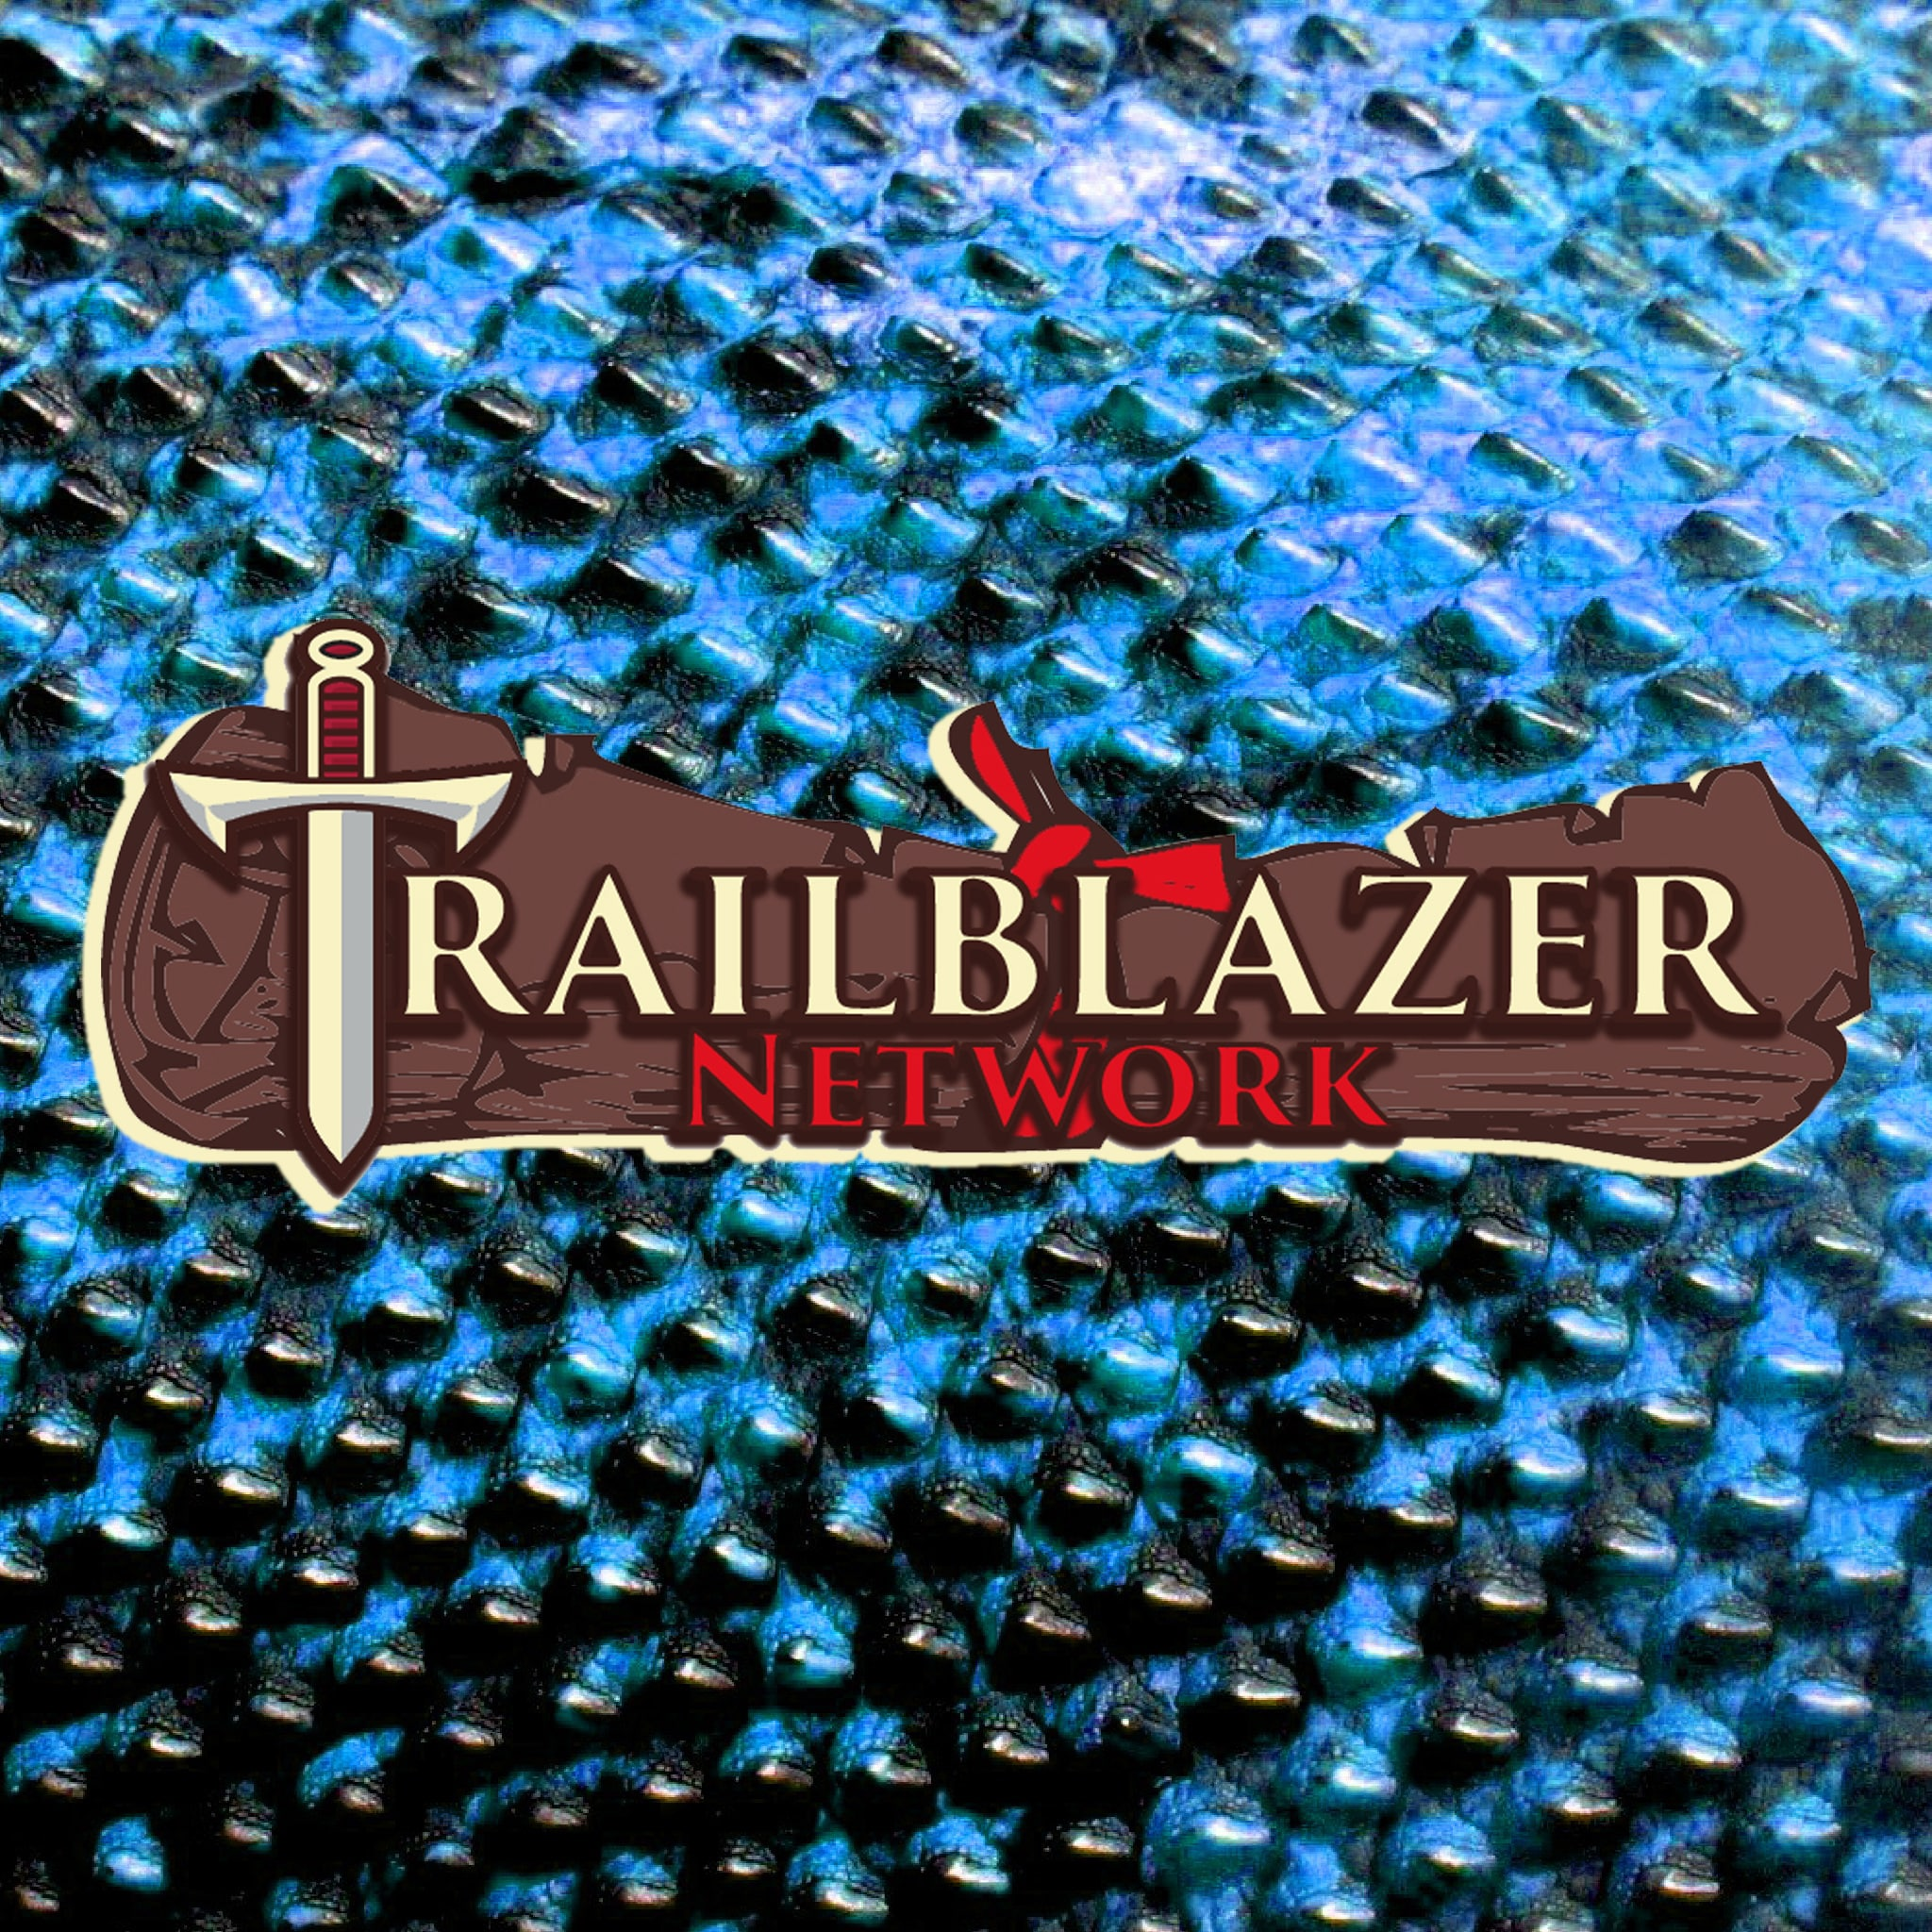 Trailblazer Network logo